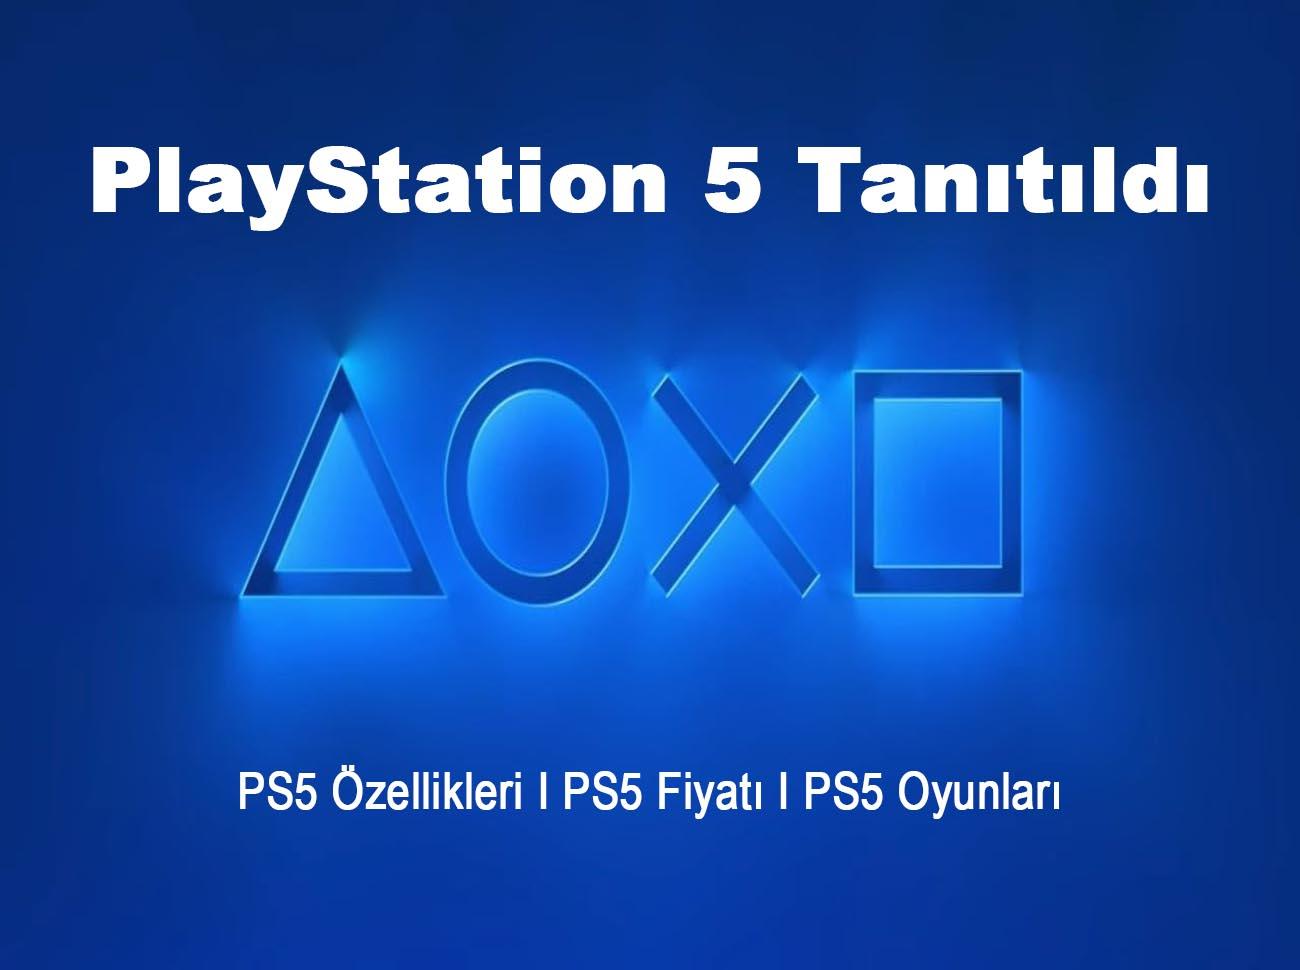 Sony PlayStation 5 Hakkında Tüm Detaylar